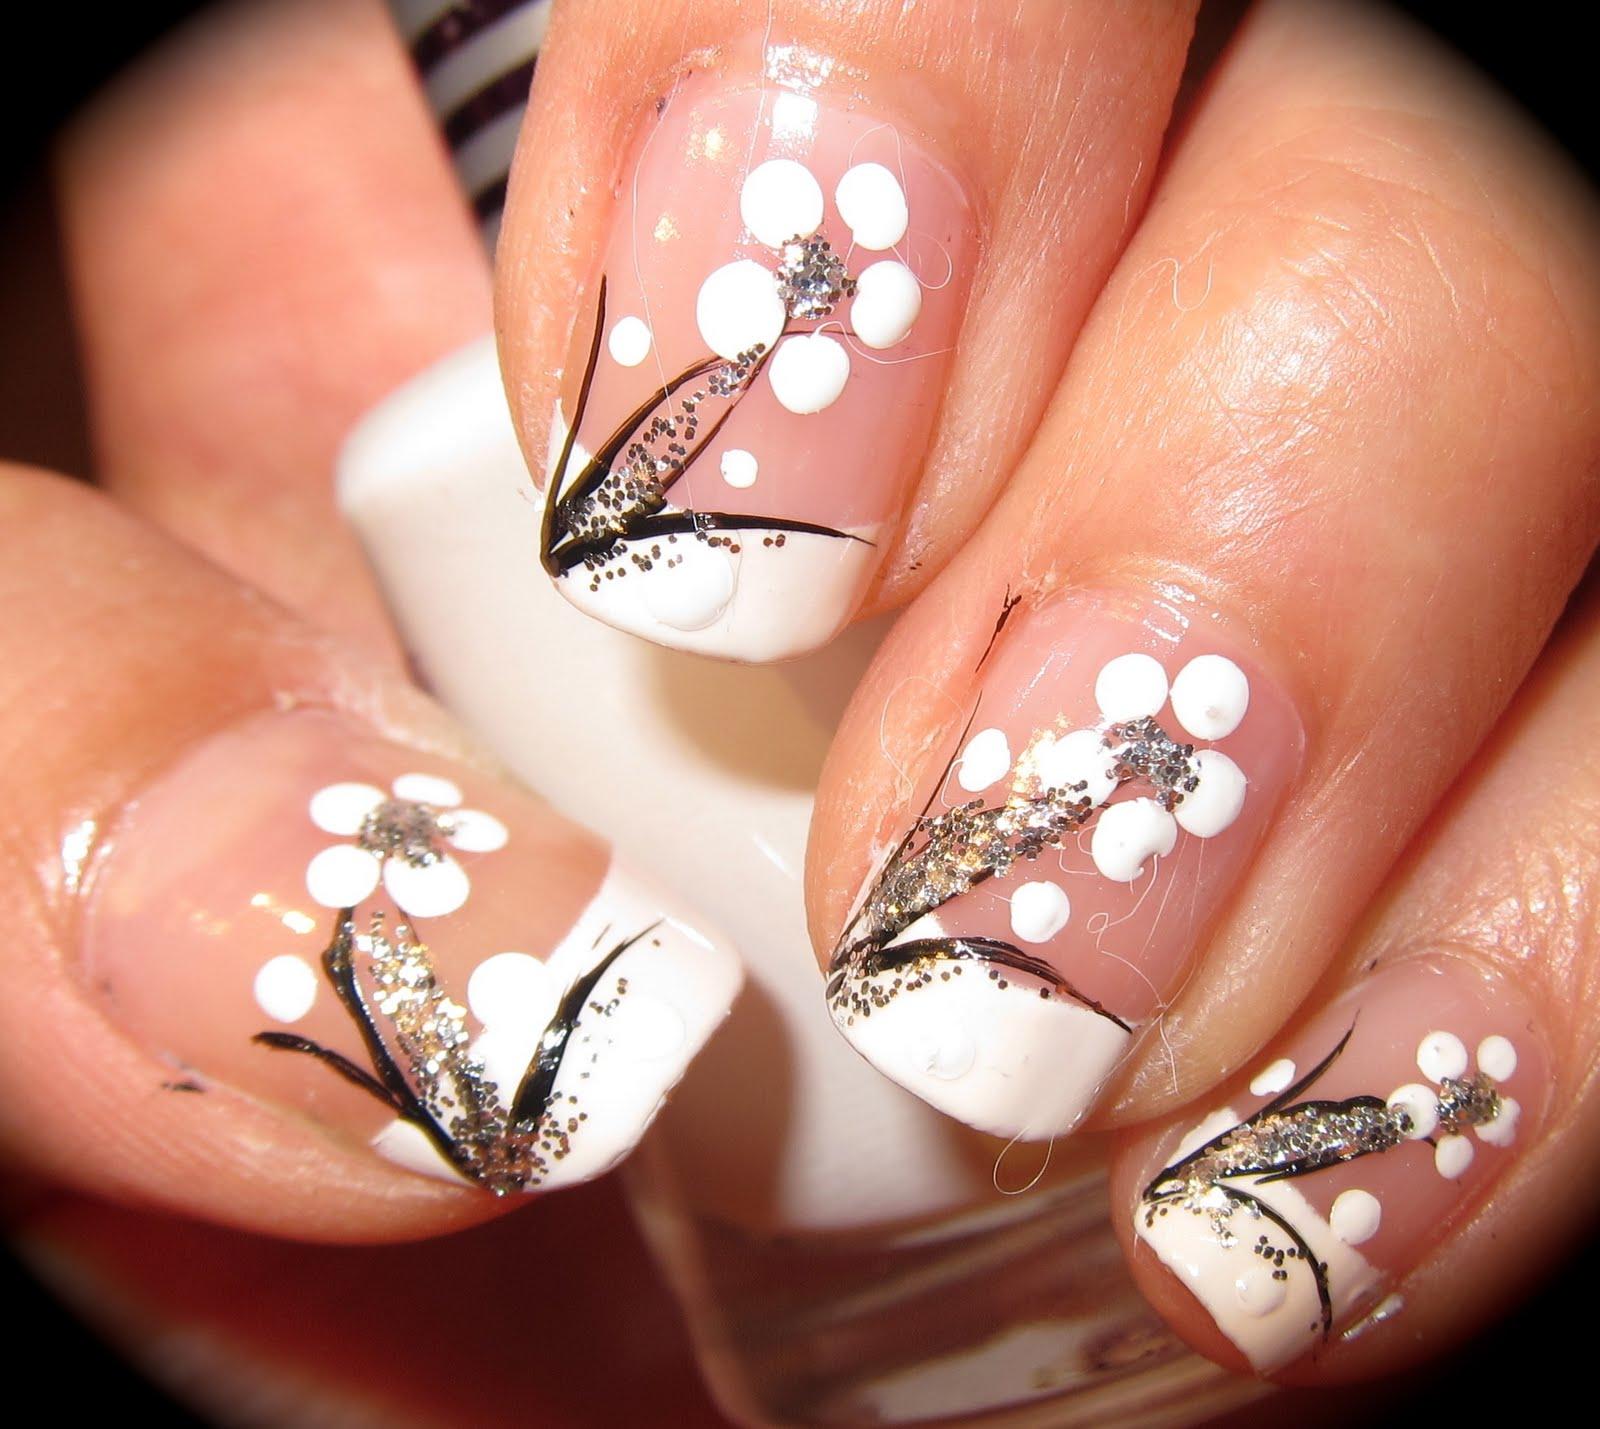 Flower Nail Designs Pedicure